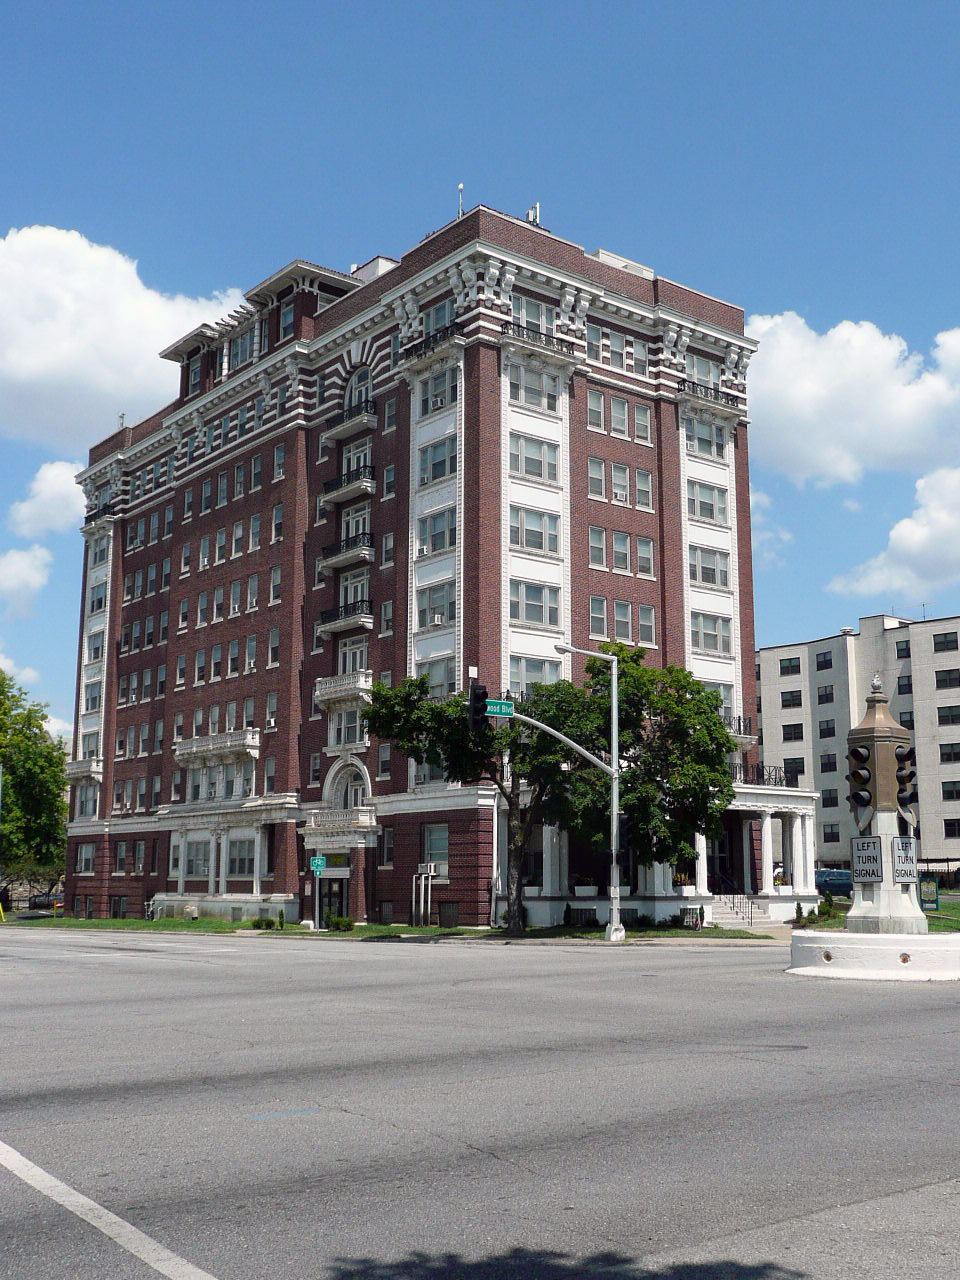 Cheap Hotels in Kansas City